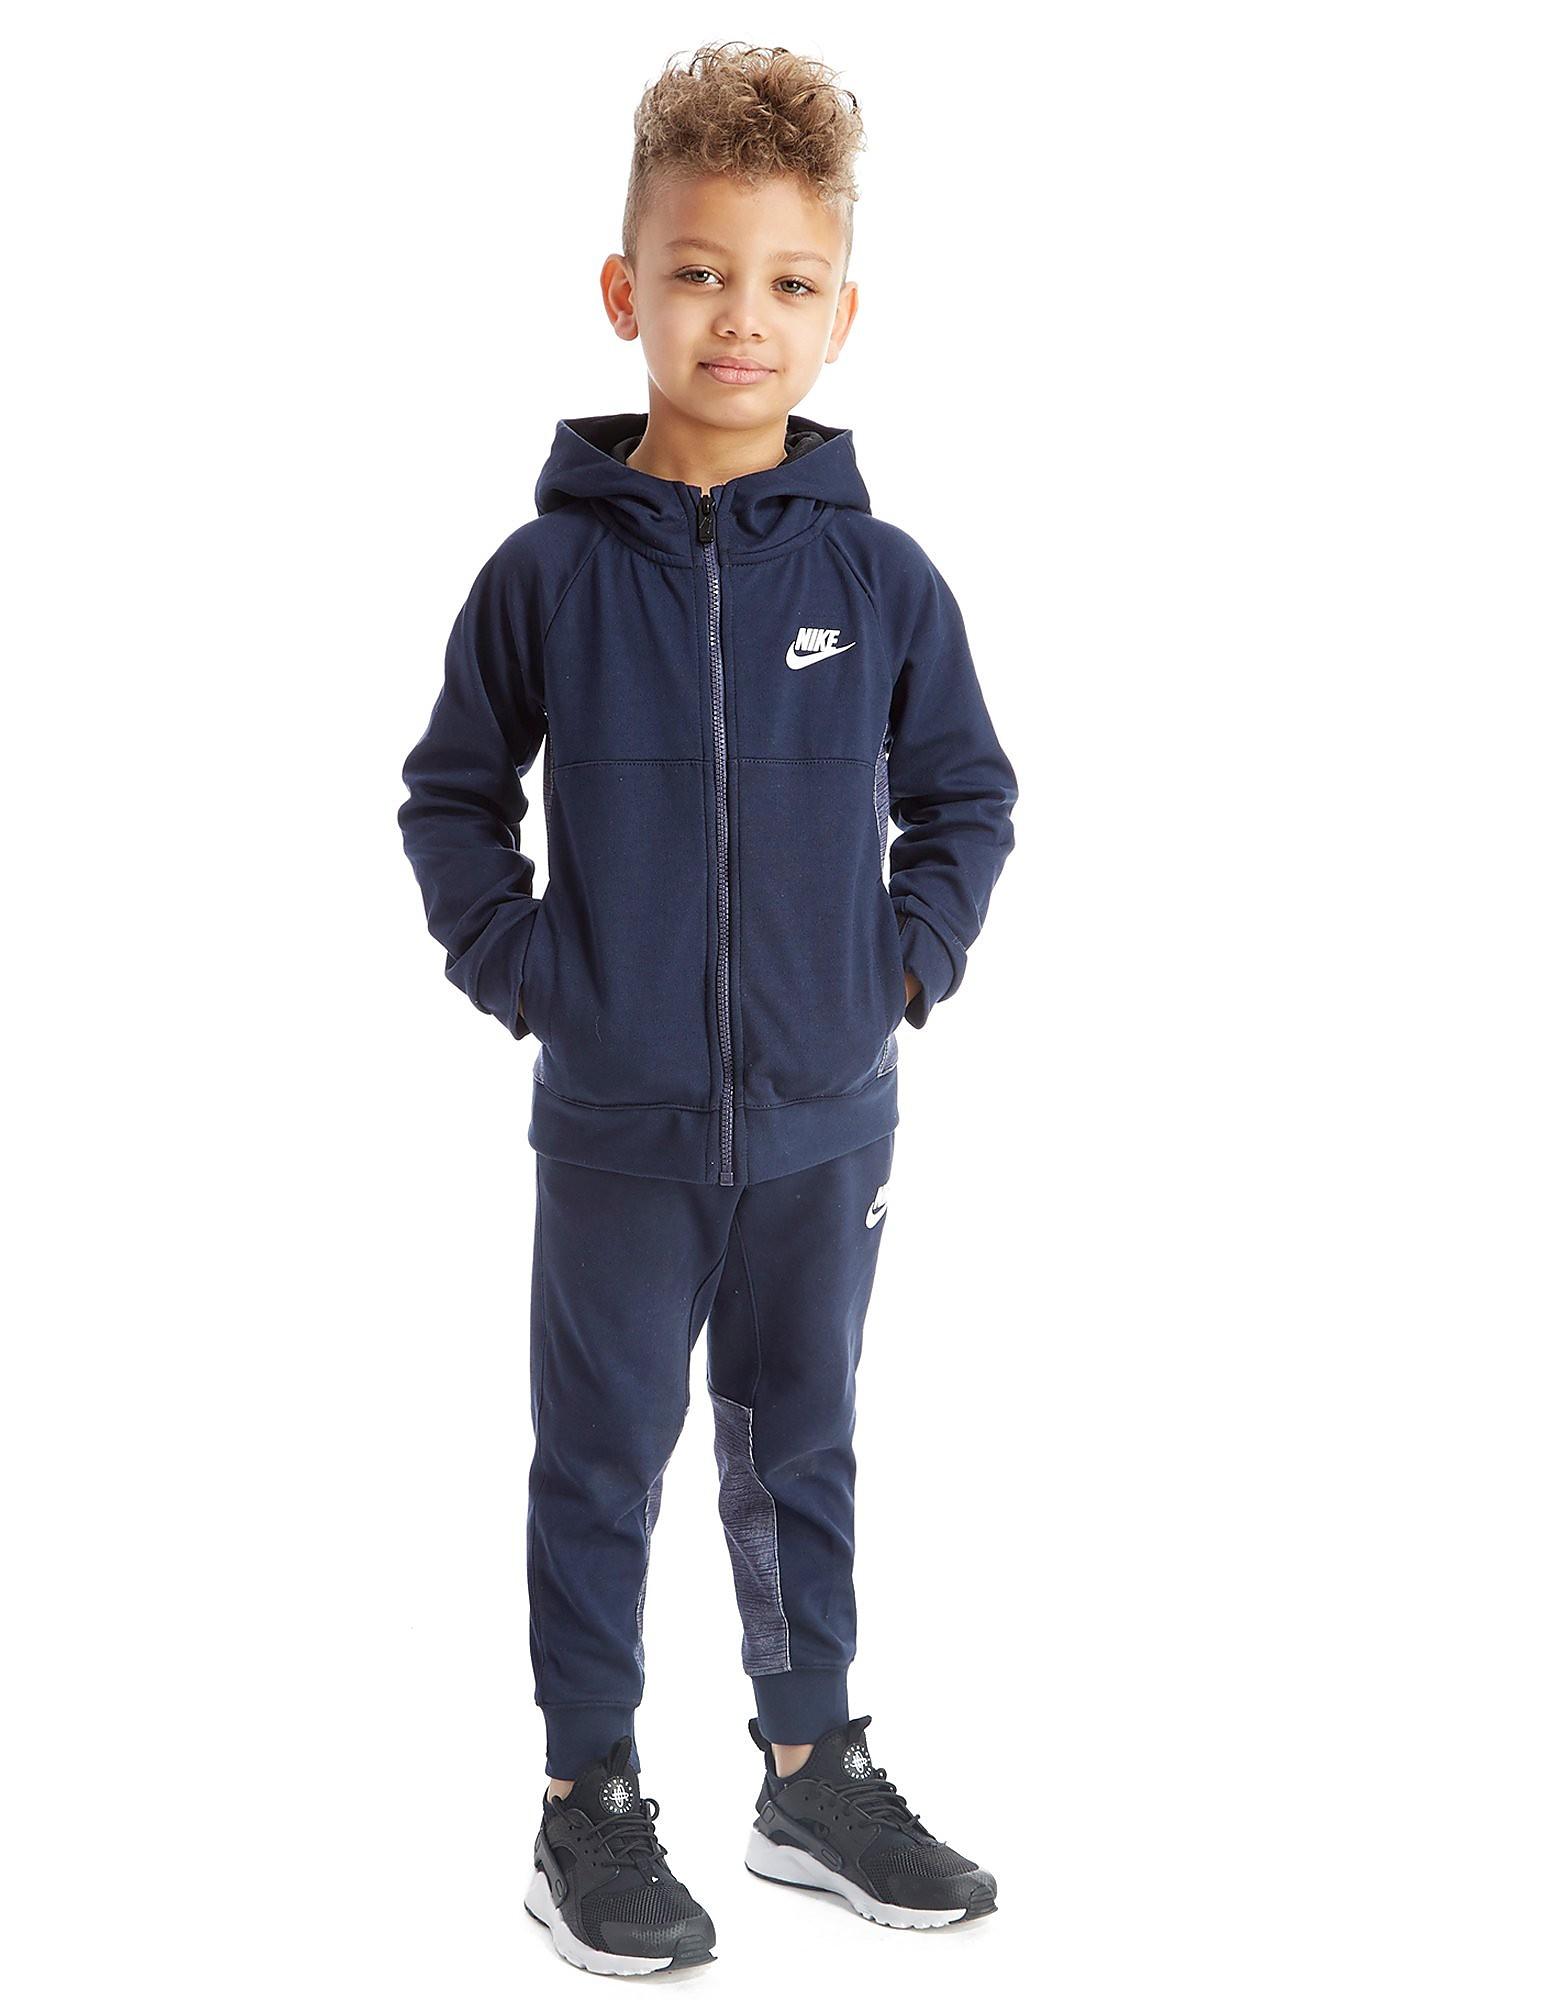 Nike Advanced Full Zip Suit Children